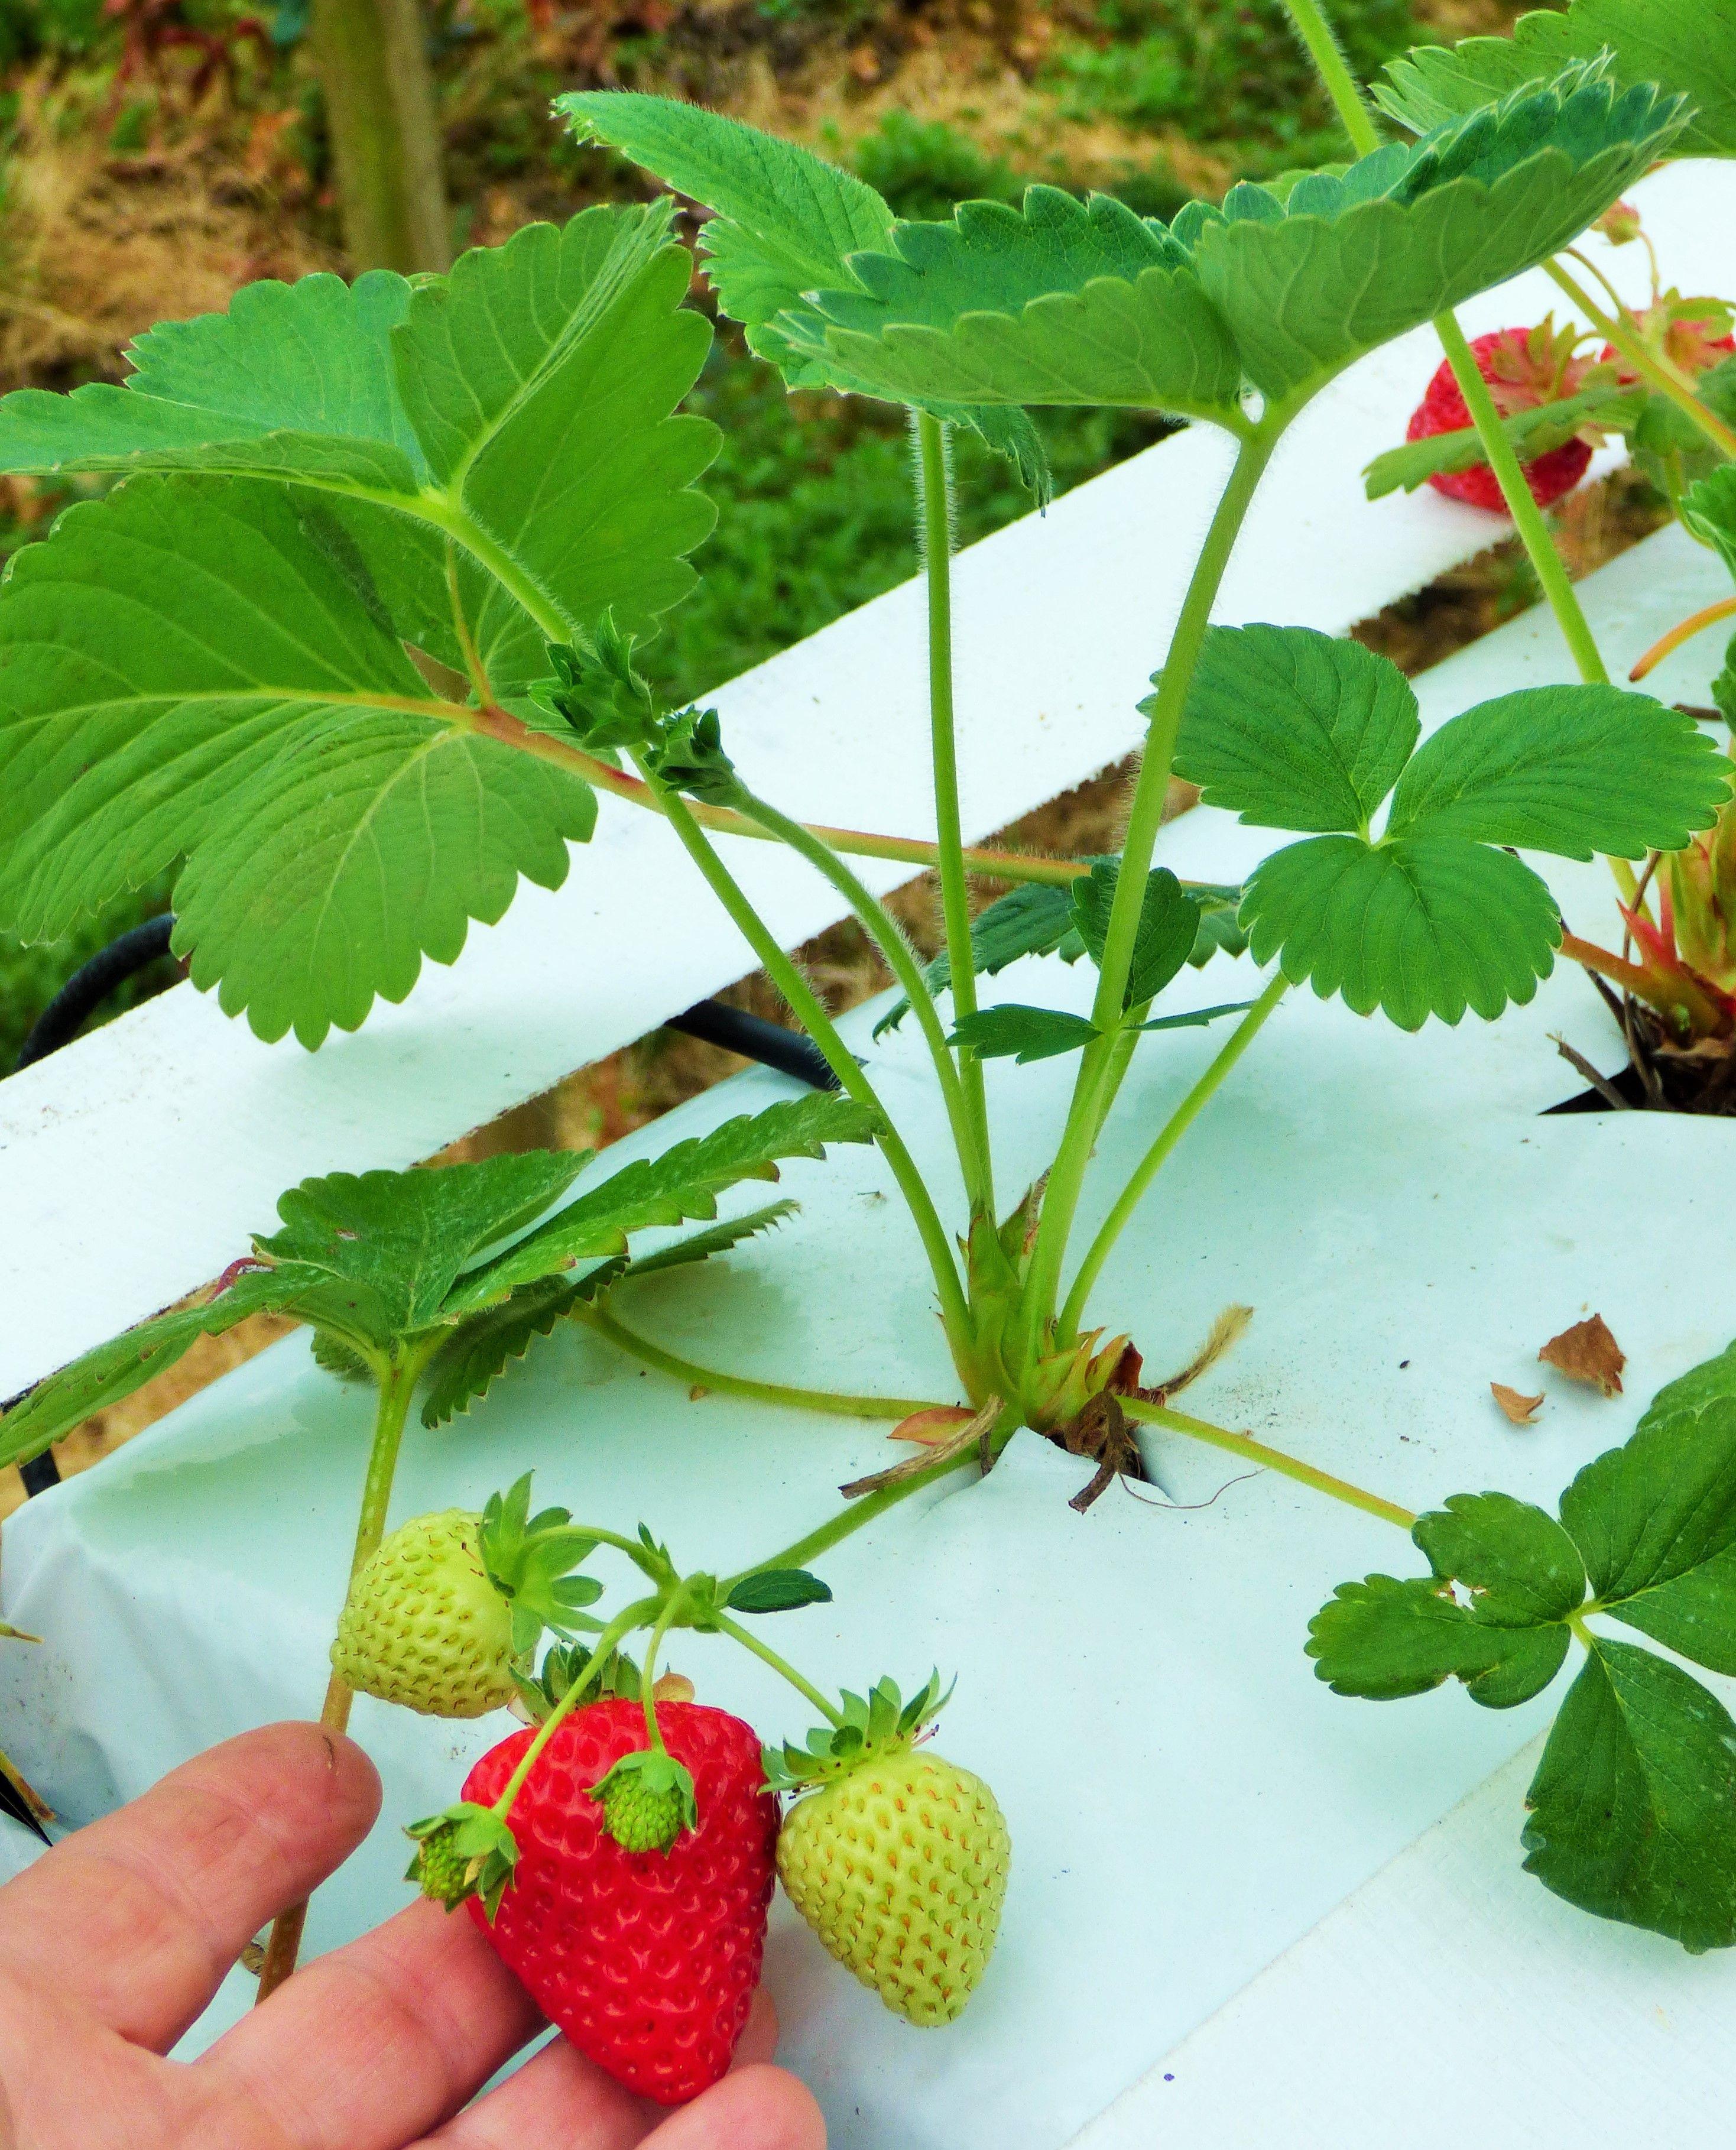 Strawberry Hydroponics Fragaria Albion Ornamental Plants Strawberry Hydroponics